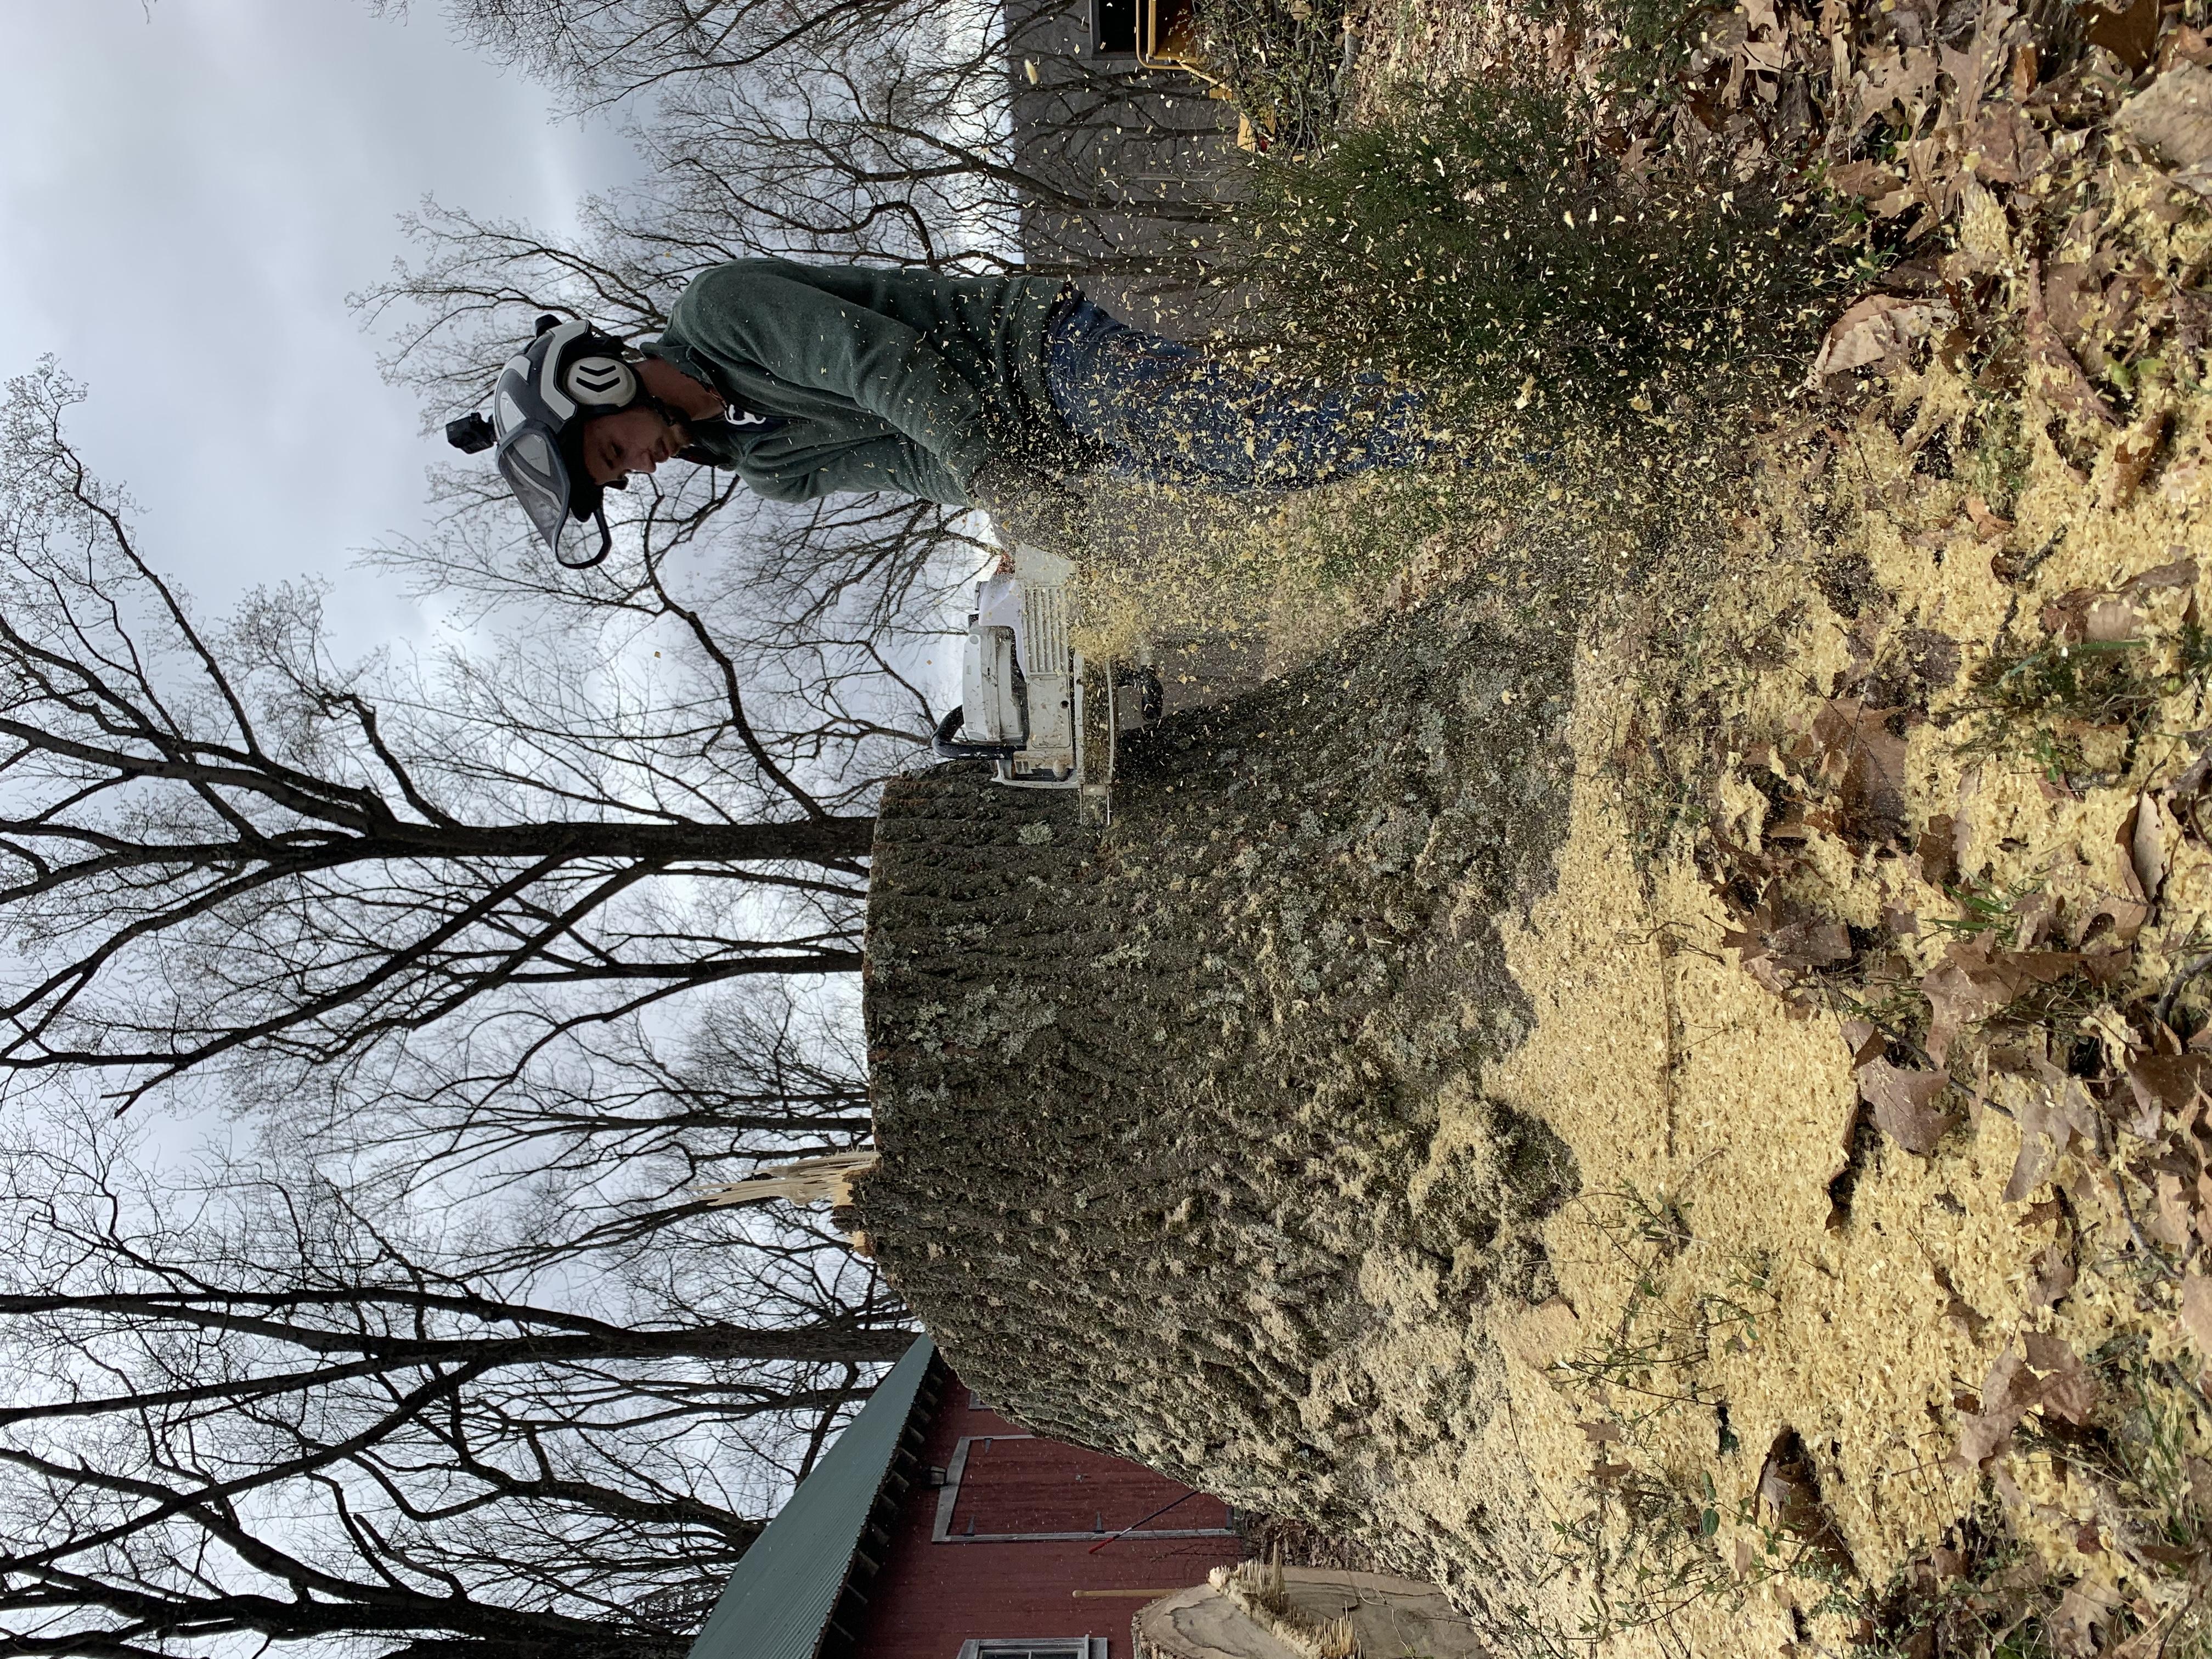 Stump cut